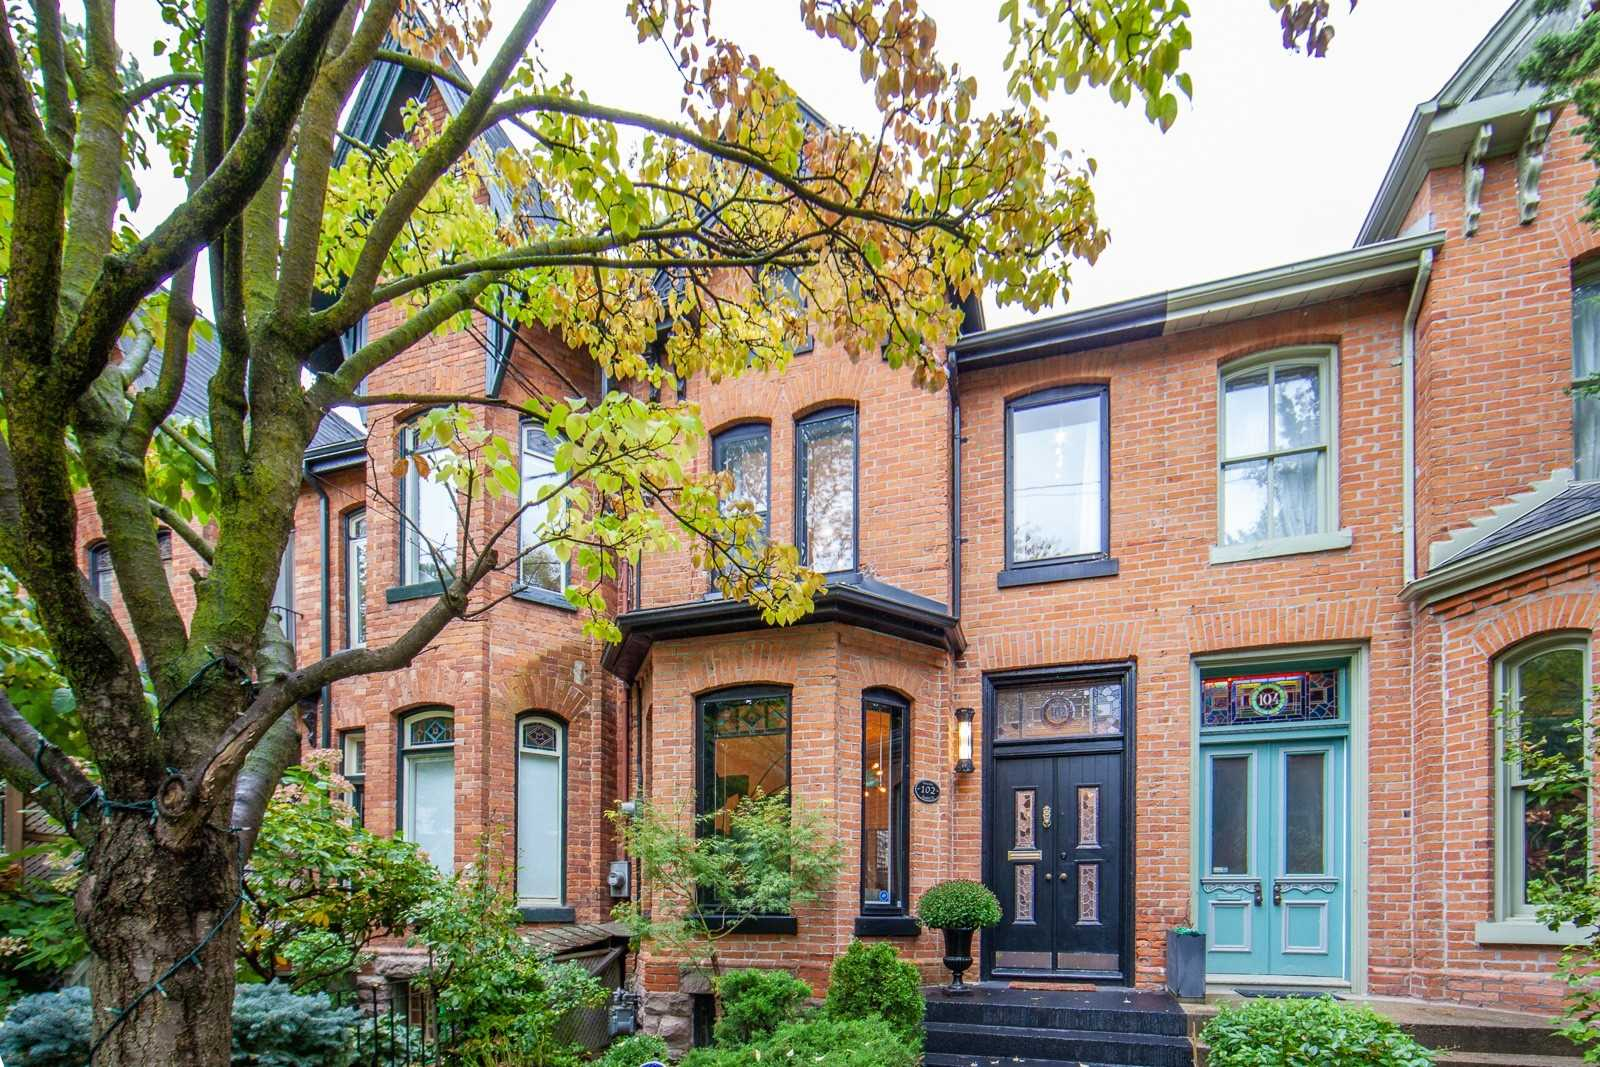 102 Seaton St, Toronto, Ontario M5A2T3, 3 Bedrooms Bedrooms, 9 Rooms Rooms,3 BathroomsBathrooms,Att/row/twnhouse,For Sale,Seaton,C5087693